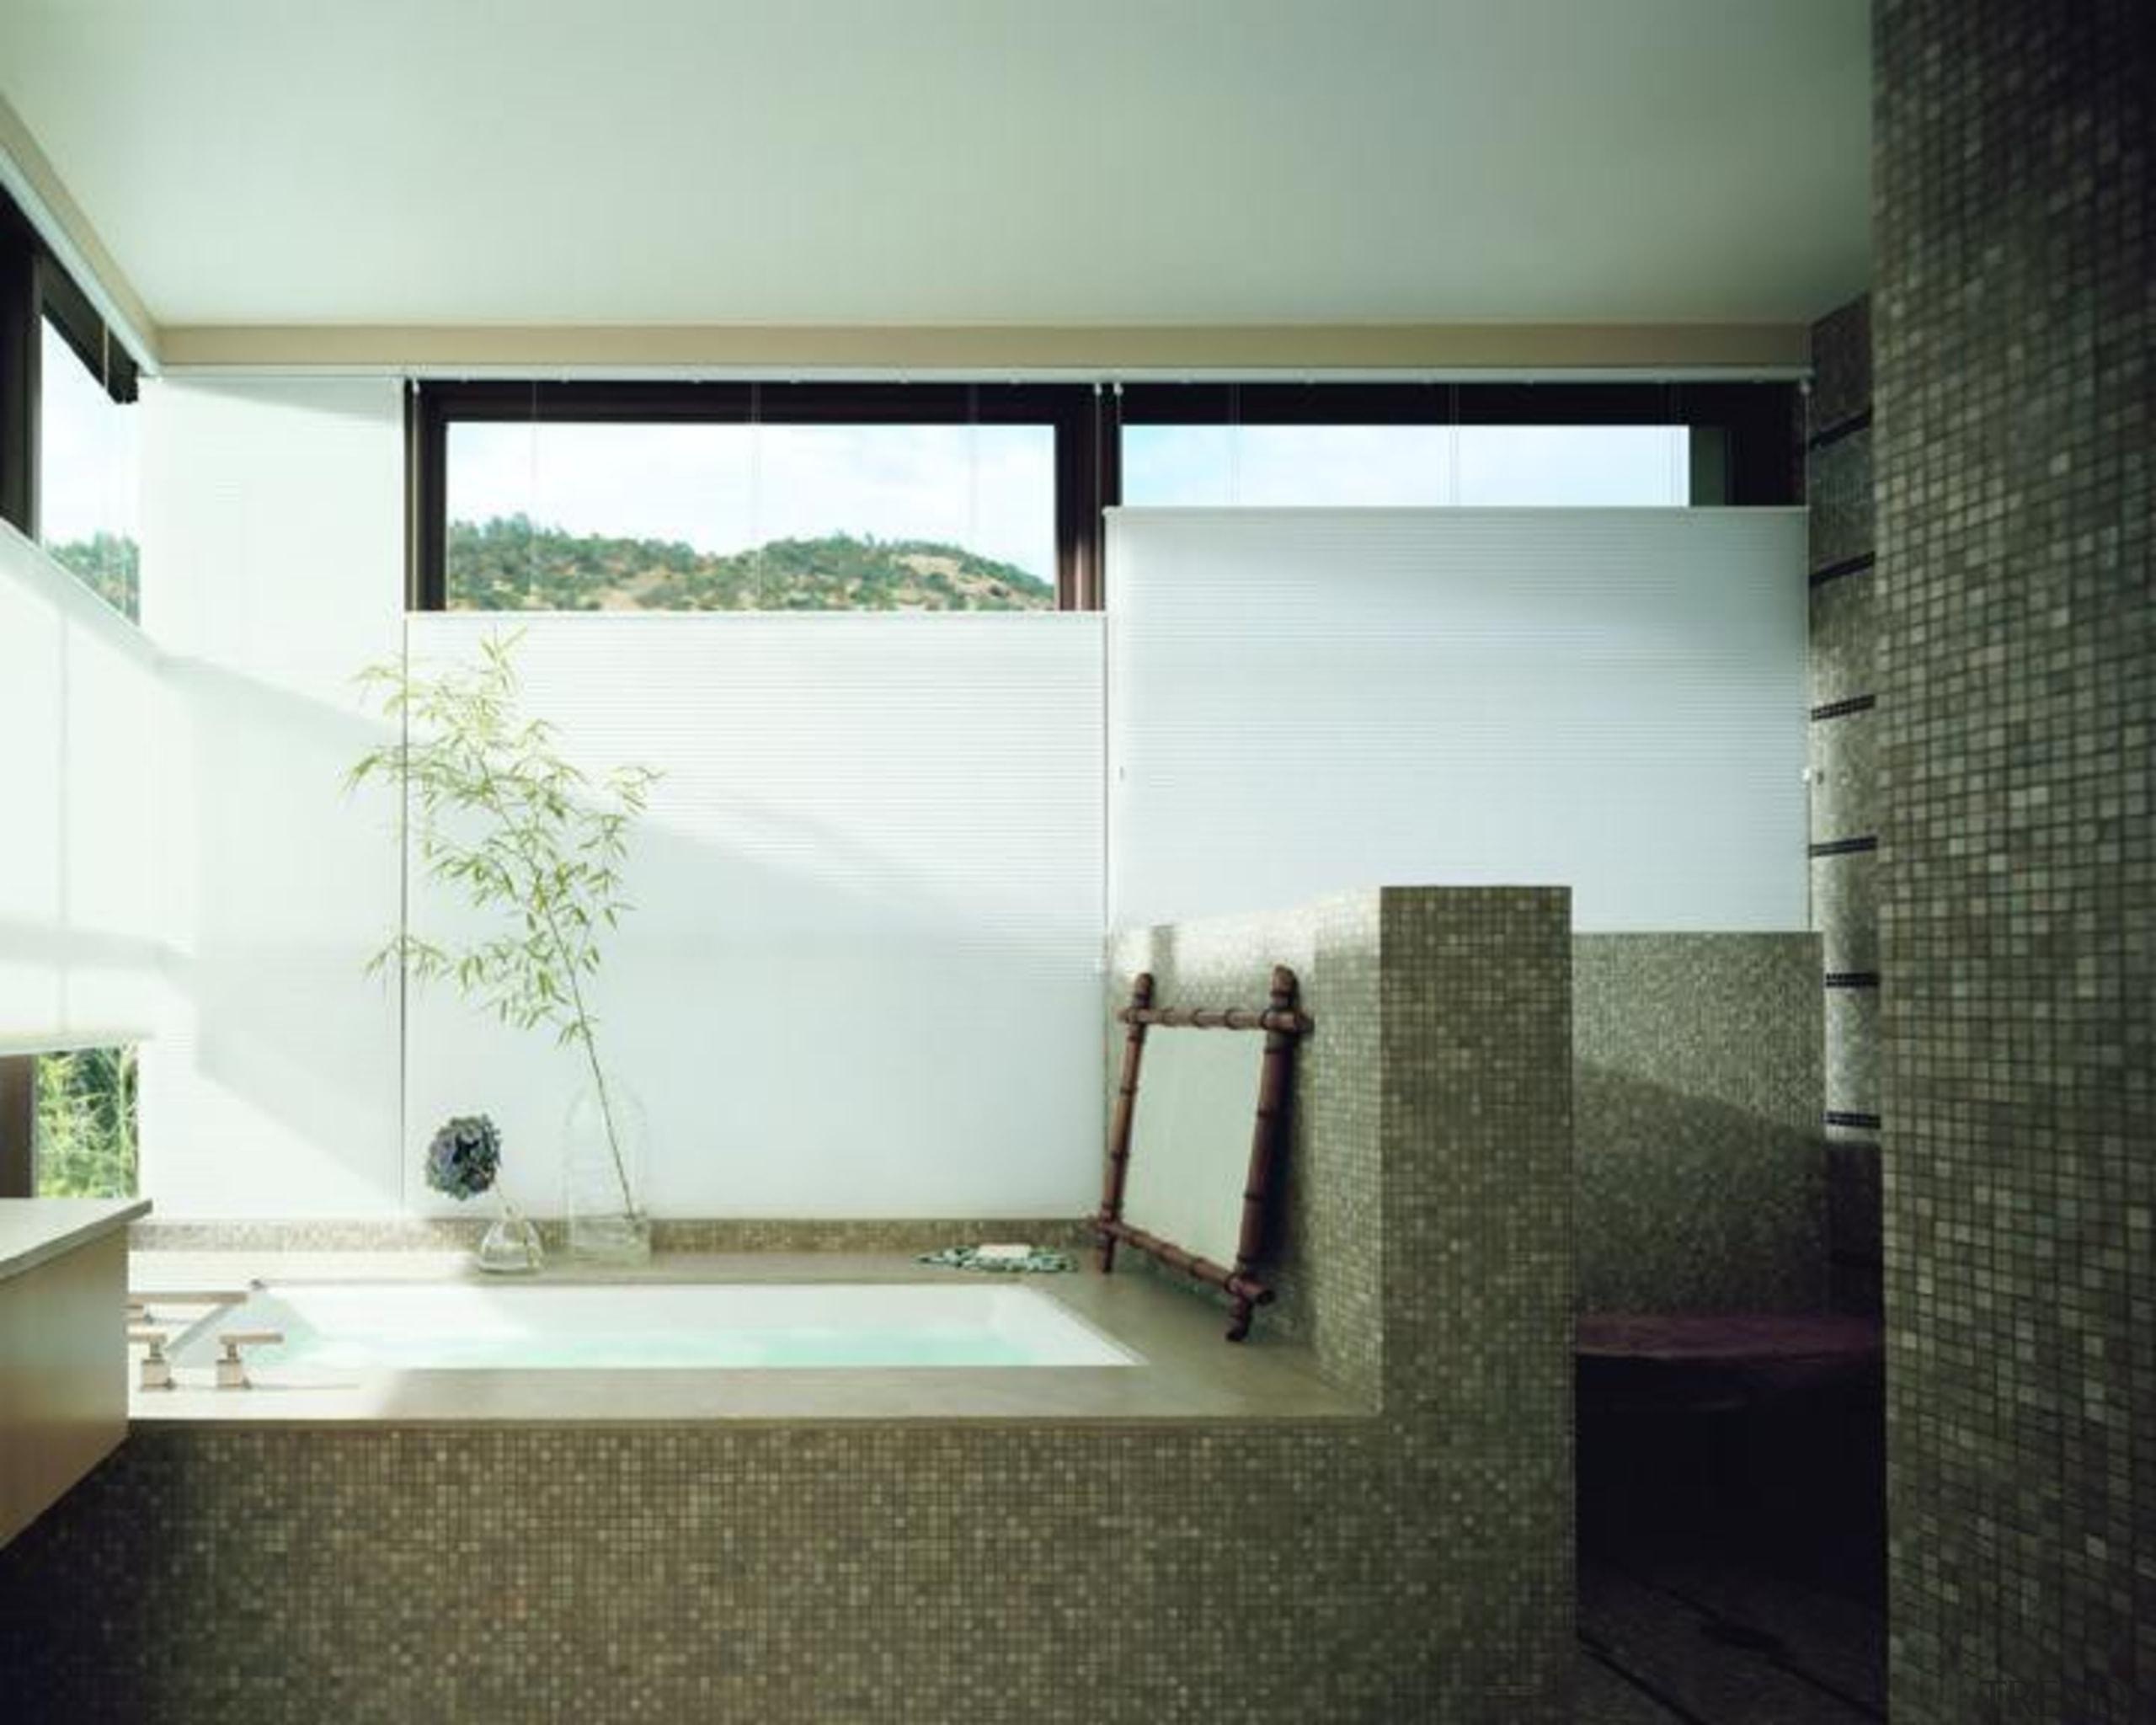 luxaflex duette shades - luxaflex duette shades - architecture, bathroom, daylighting, floor, glass, home, house, interior design, room, window, white, black